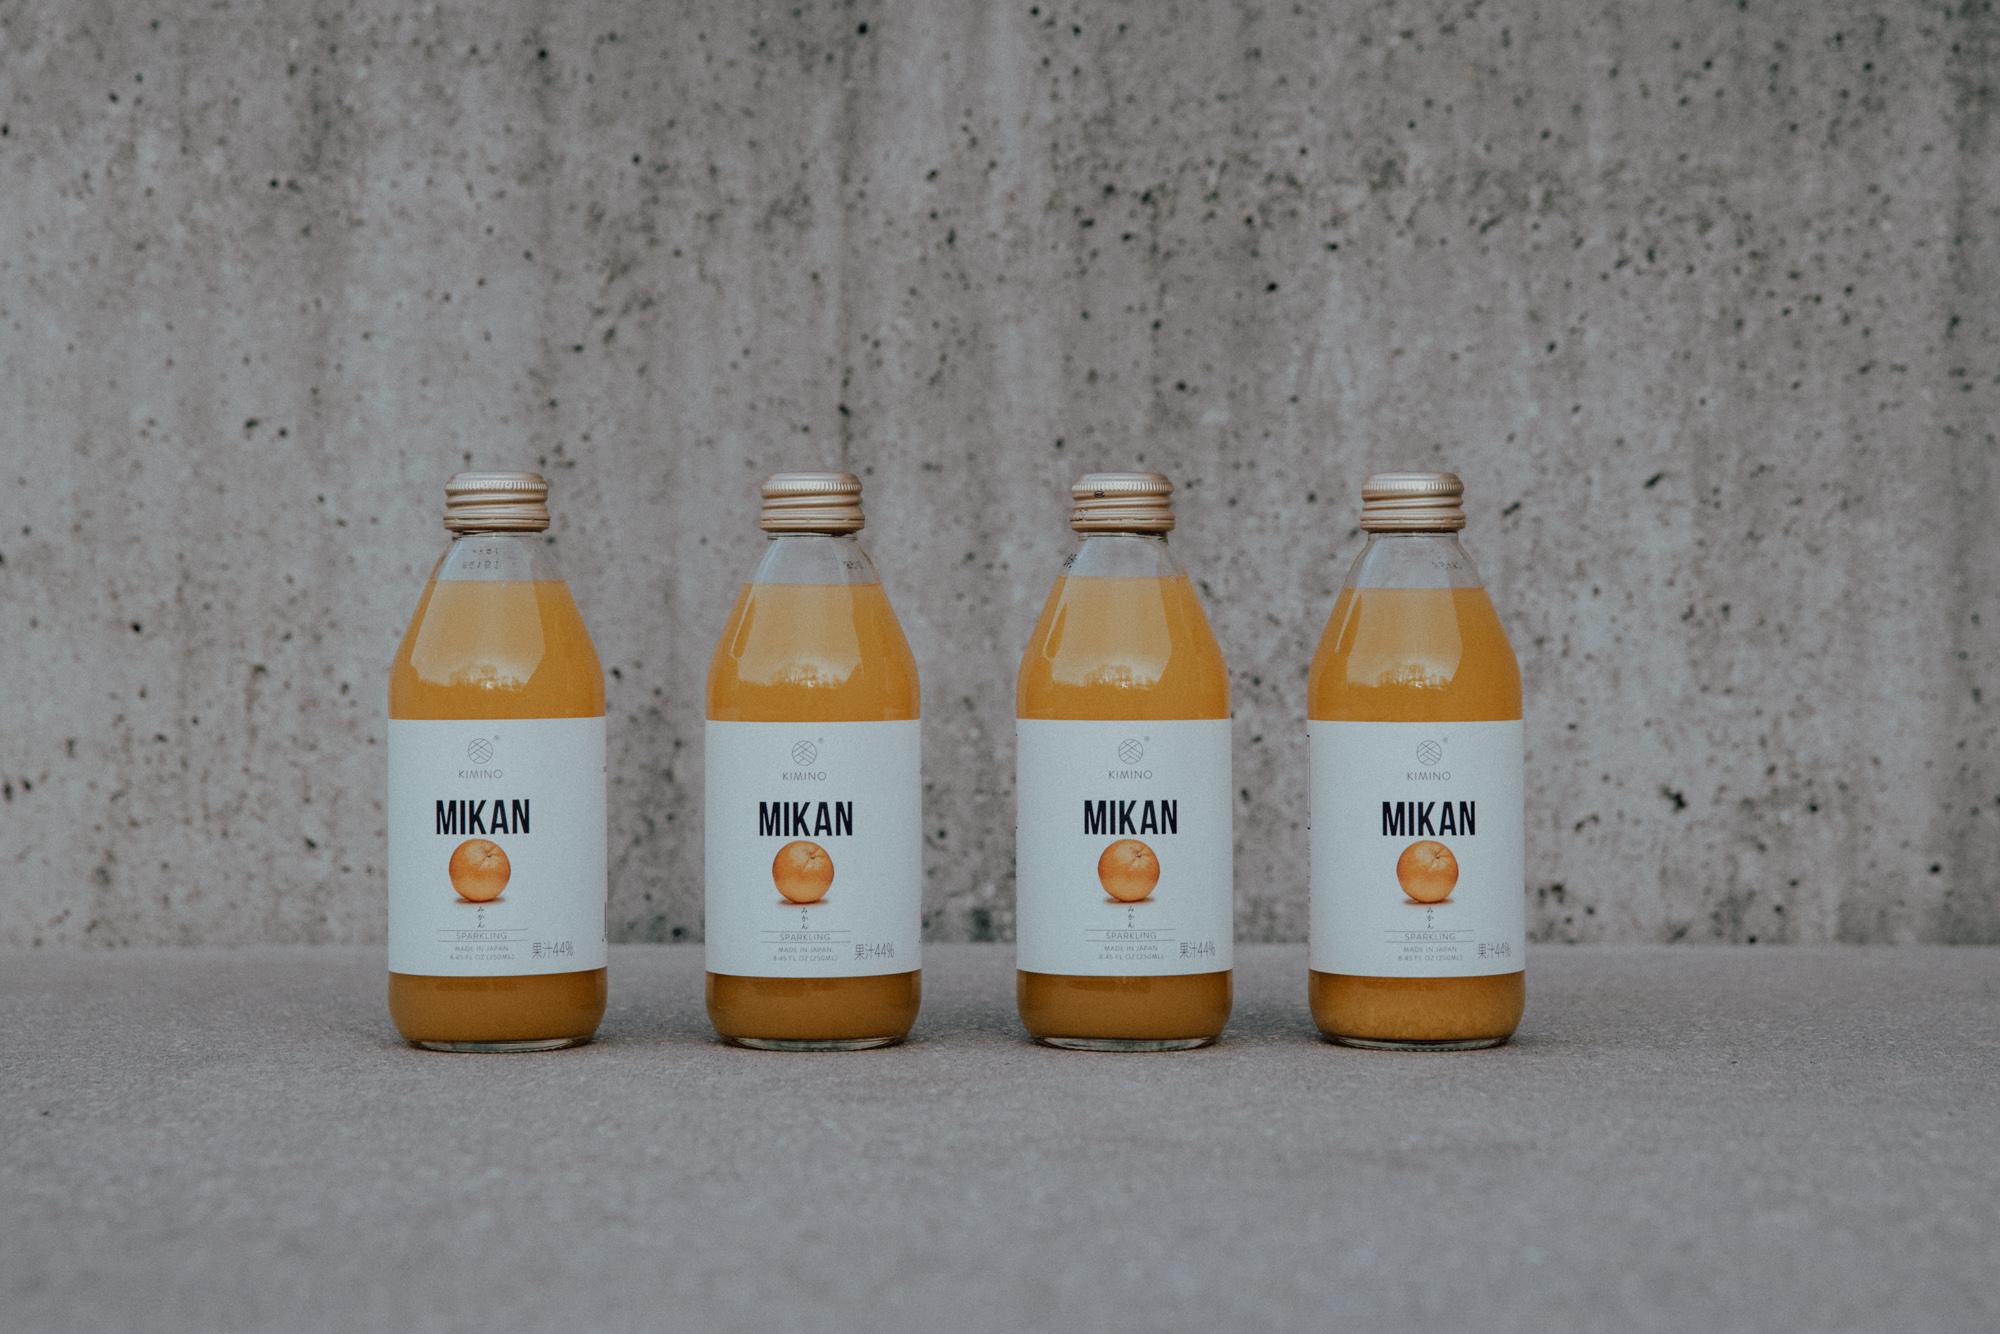 Andreas Lugmayr Kimino Sparkling Soda Mikan